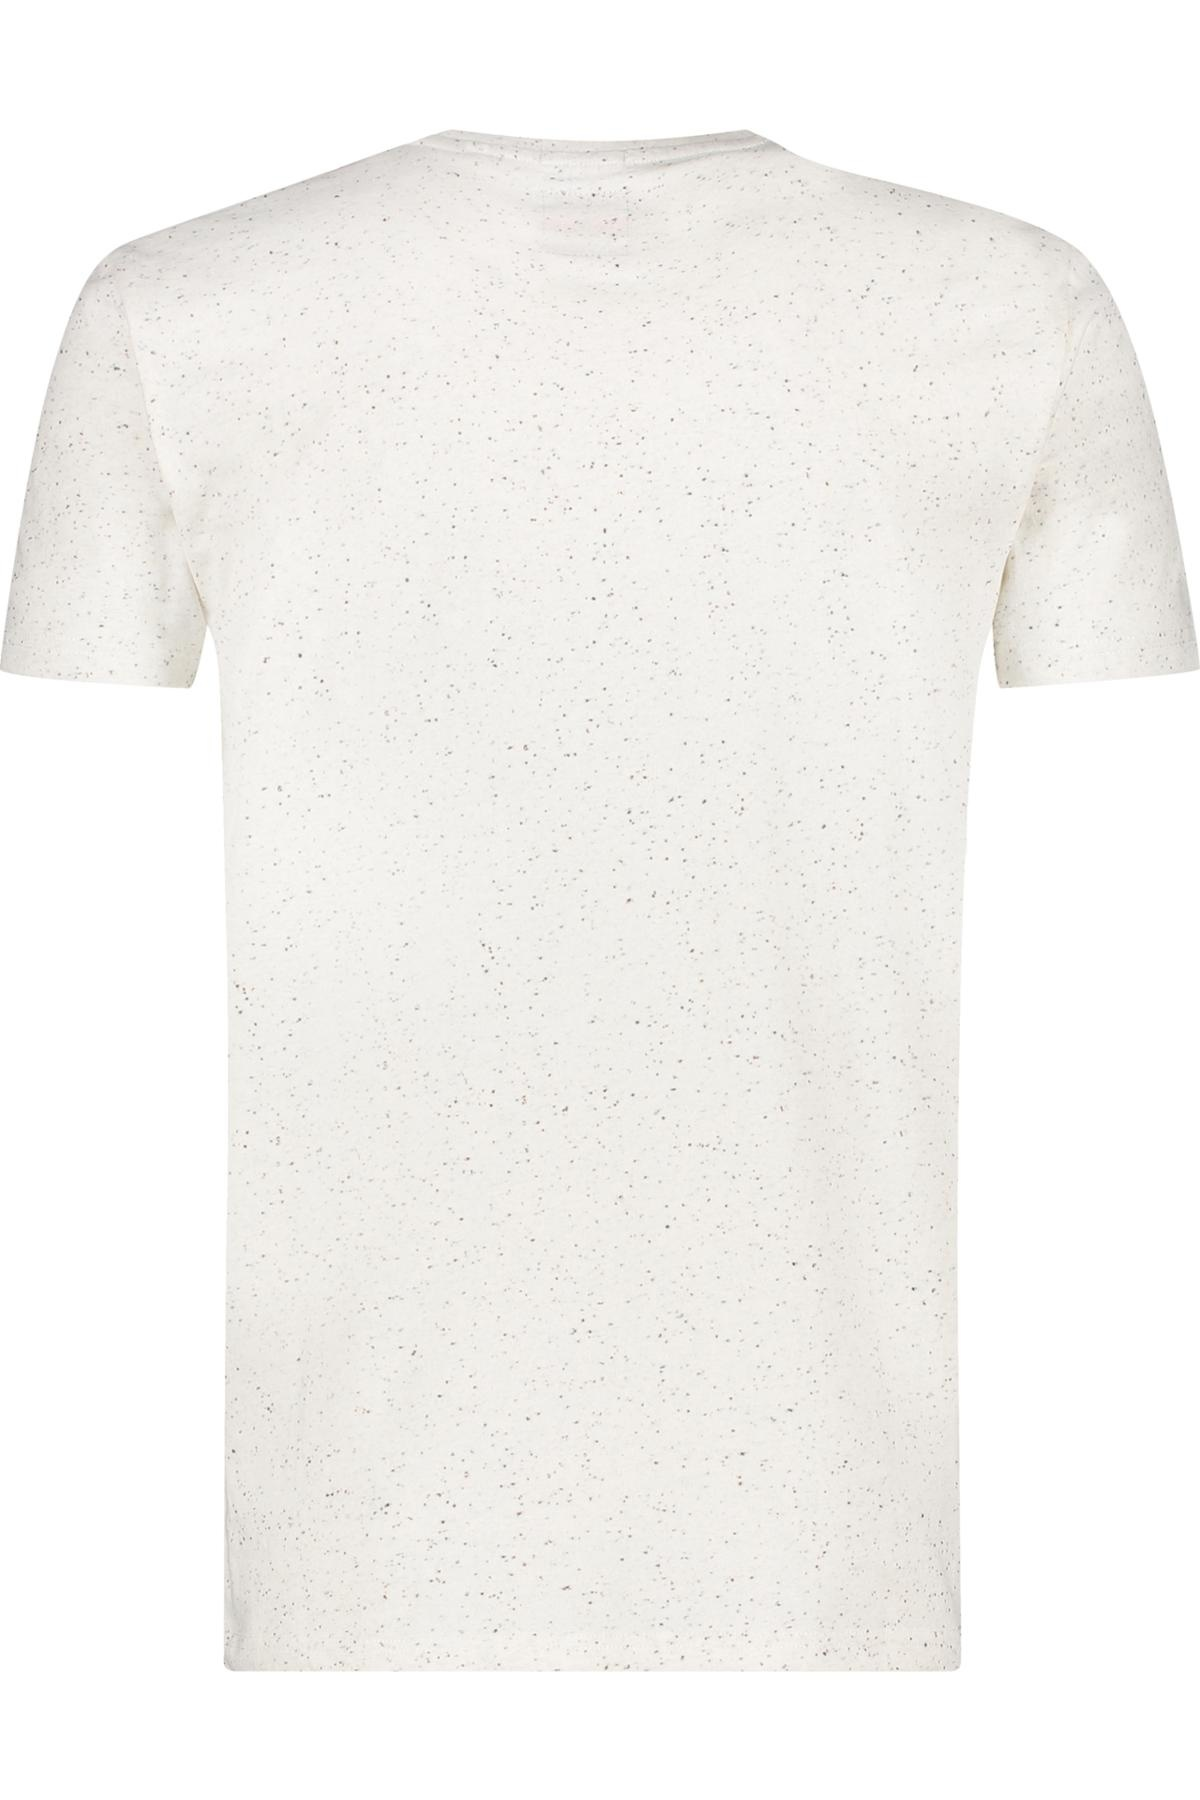 T-Shirts - Husky Embro-3